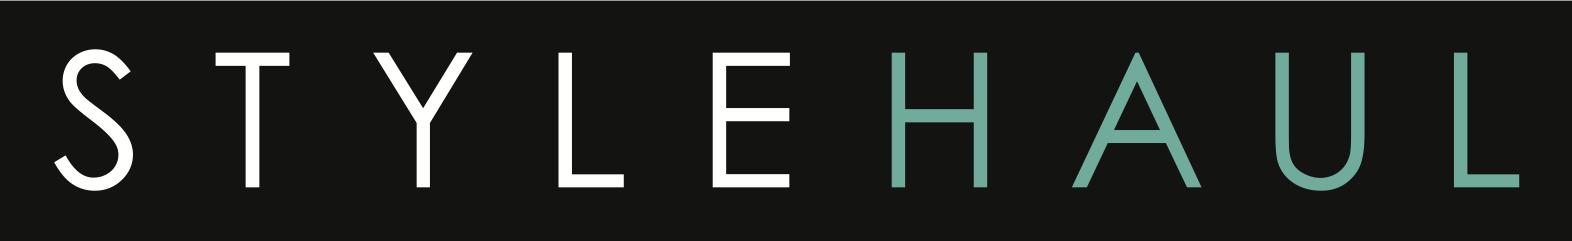 StyleHaul Logo